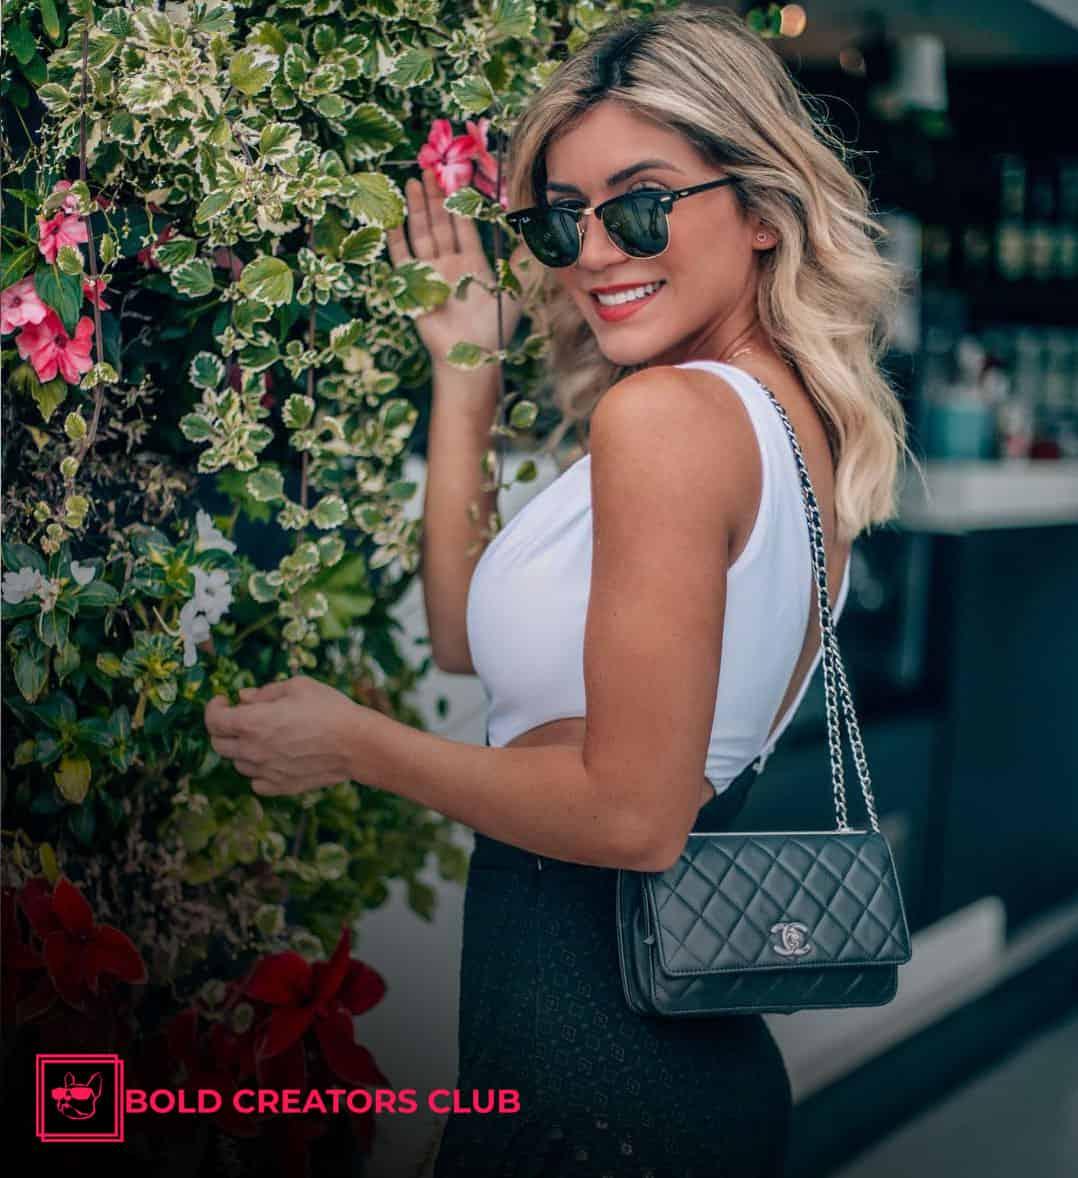 Jessica Belcost Bold Creators Club Influencer Marketing Agency South America Brazil